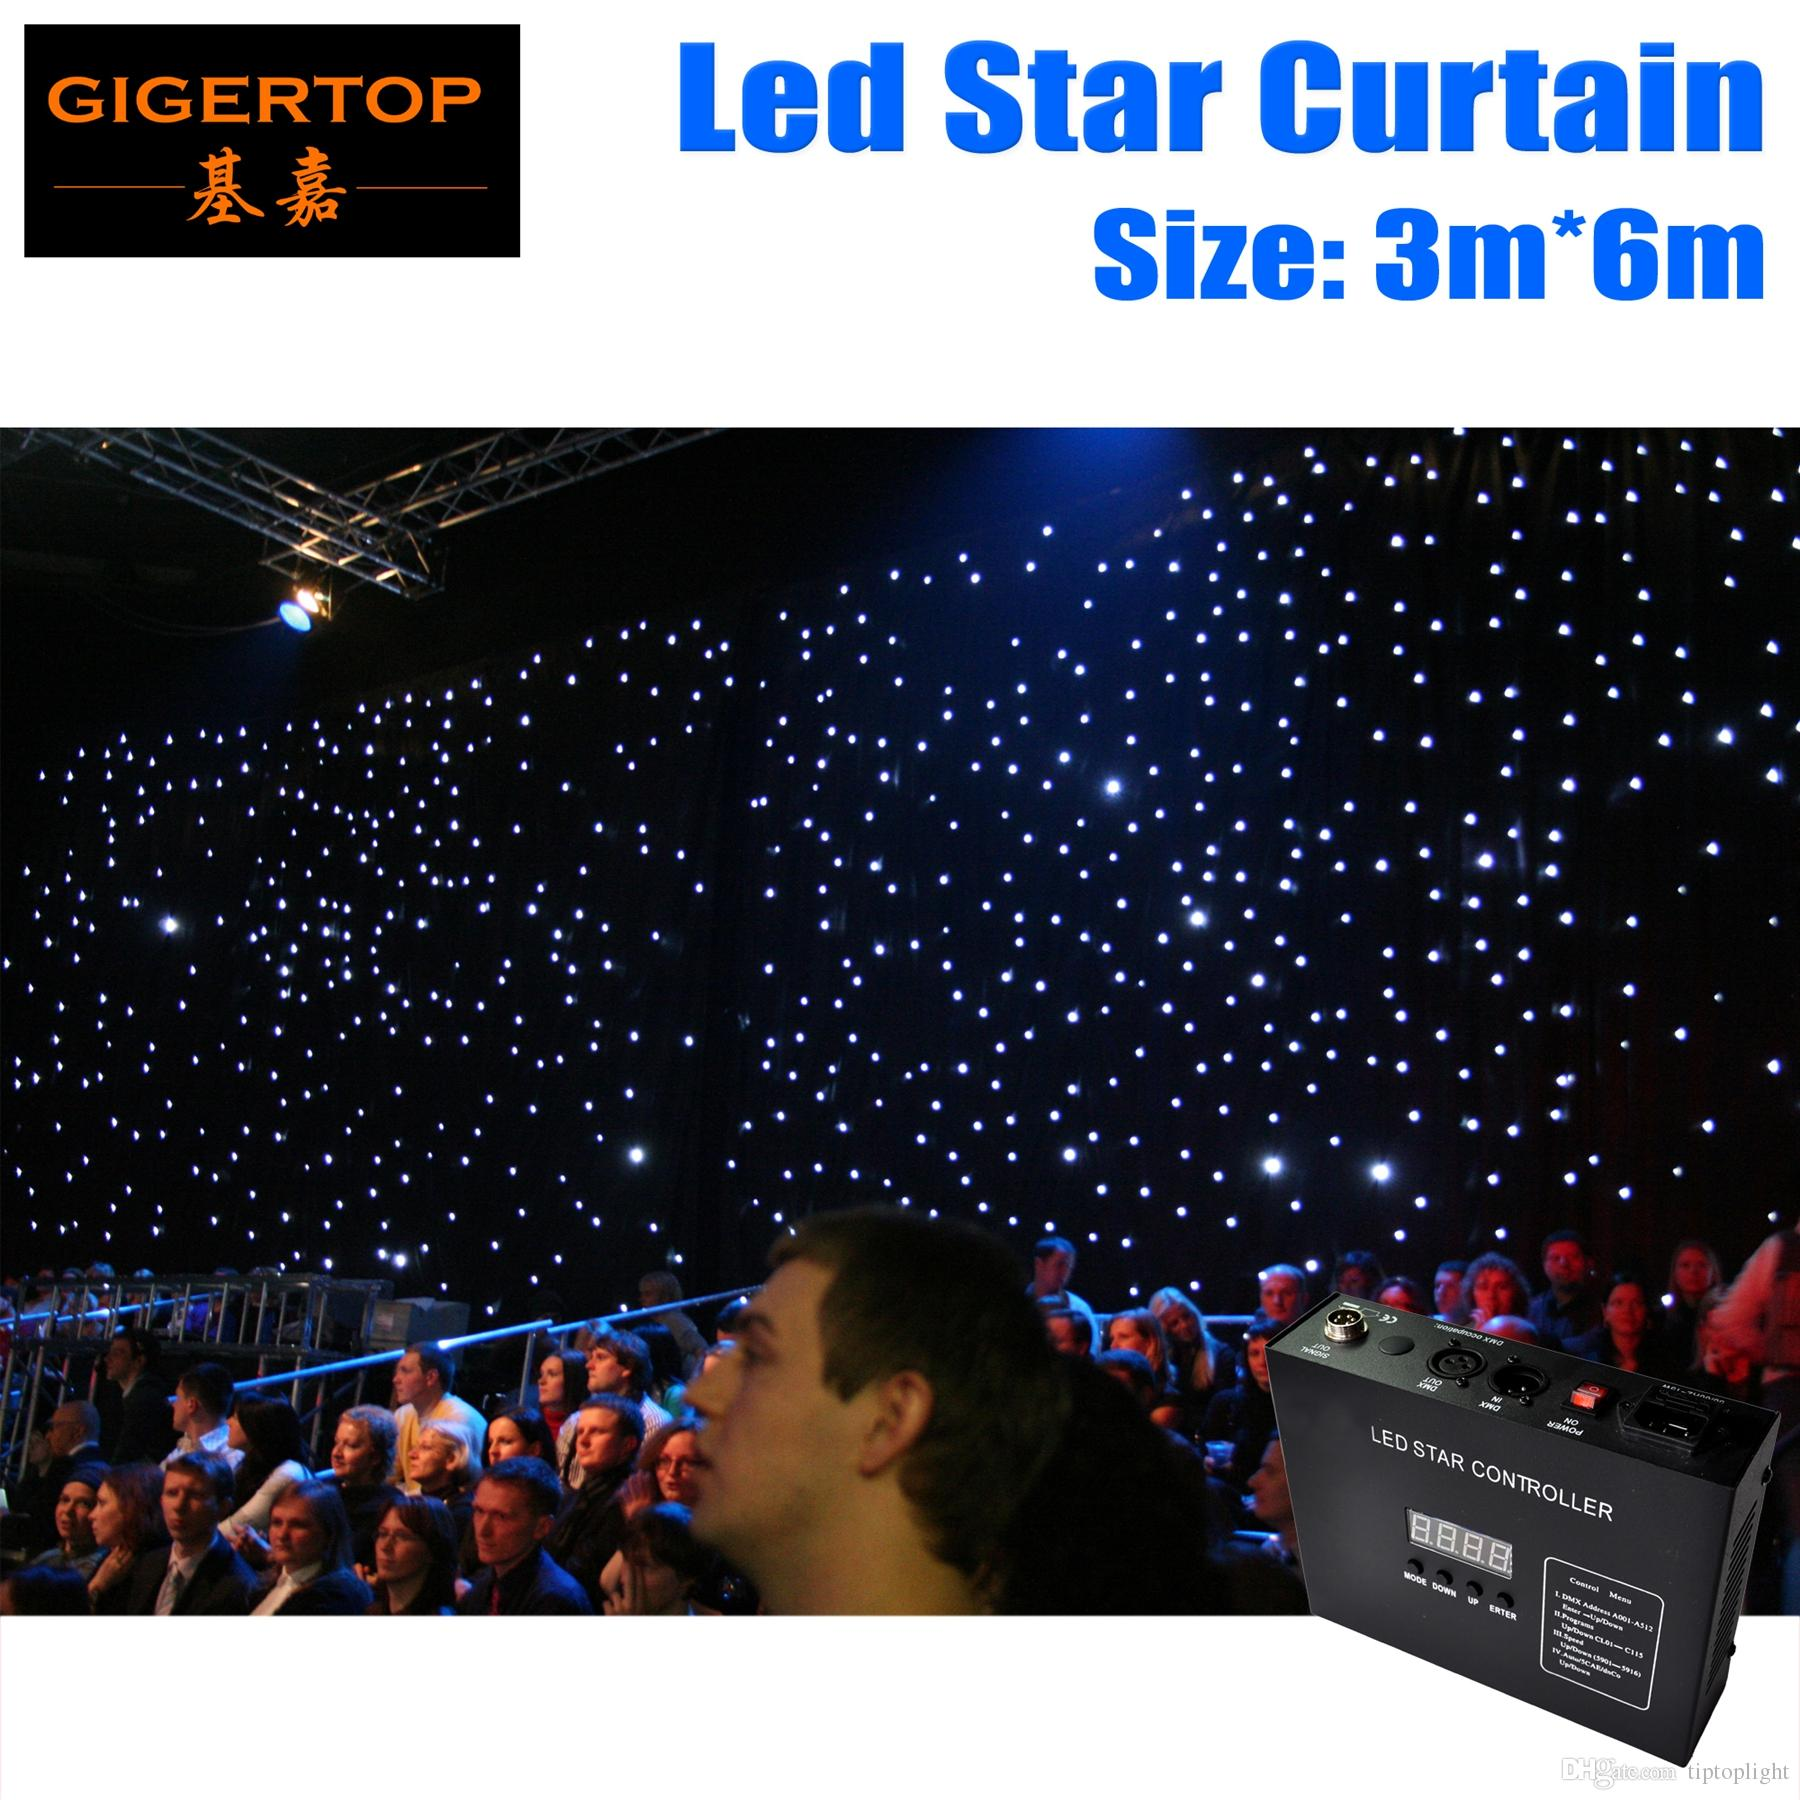 Freeshipping 3M * 6M LED STAR-gardin RGBW 240PCS LED-färggardin DJ Kjol DJ Booth DMX Controller Control / Auto / Ljudläge Flam retardant